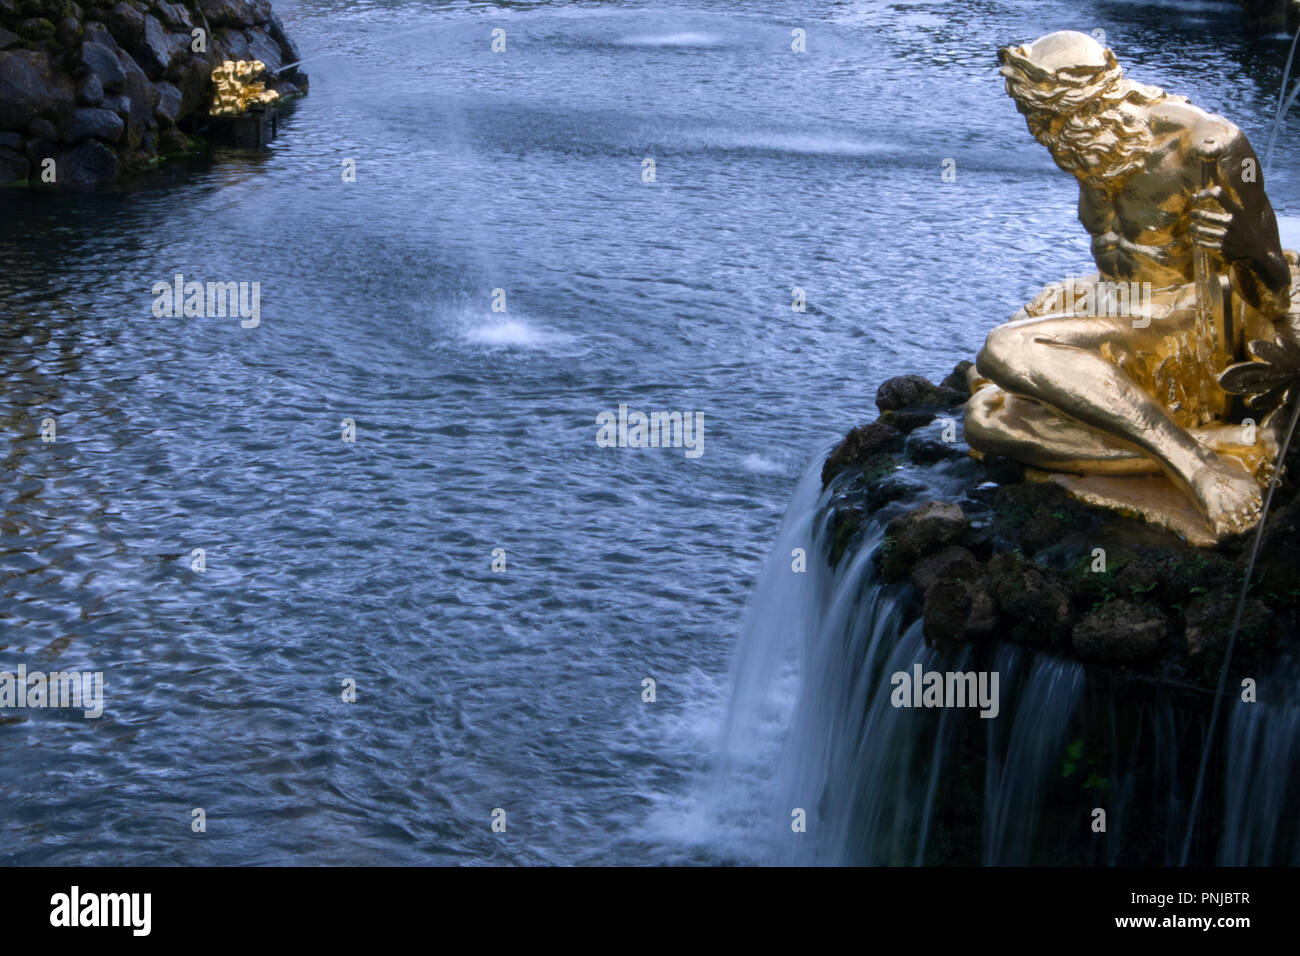 "Fountain ""Big Cascade"" in Peterhof Lower Park, Saint-Petersburg, Russia, gilded statue of Neptune, 18th century landmark Stock Photo"